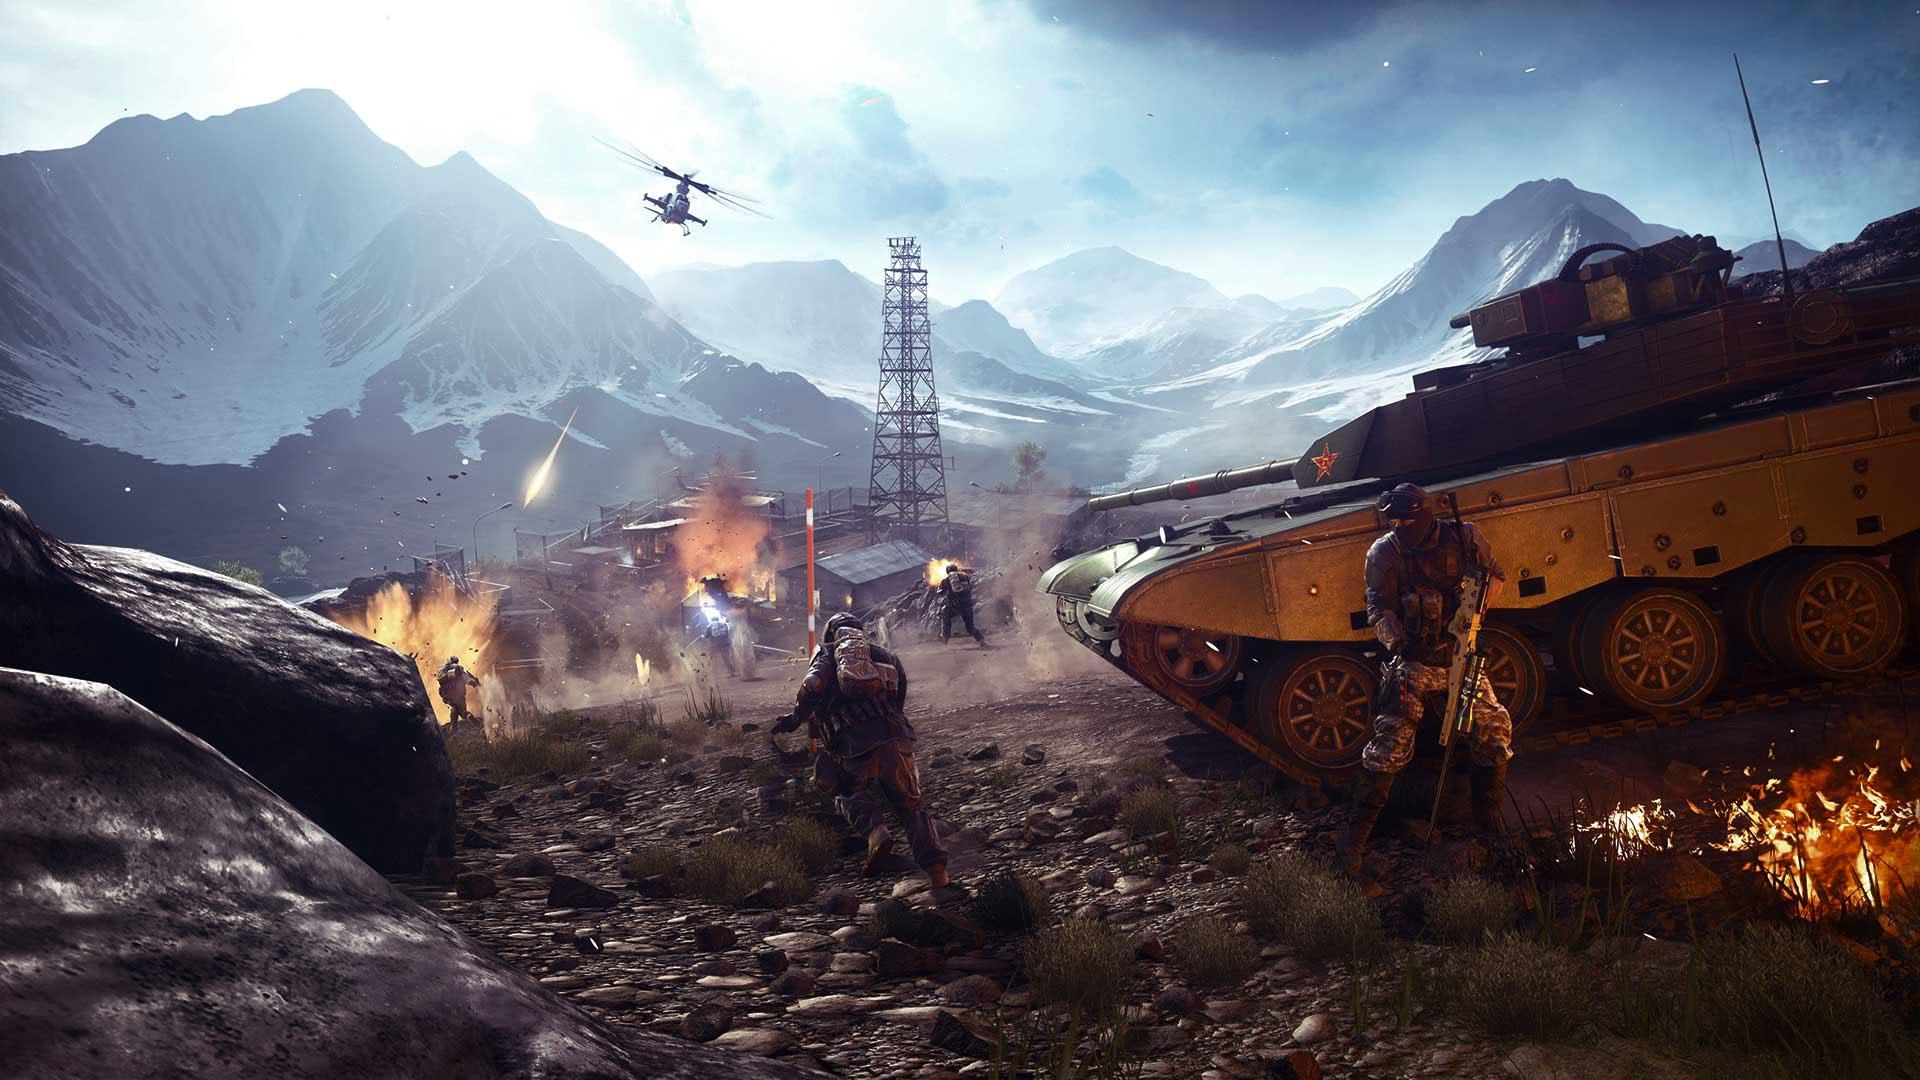 Battlefield 4's big fall update brings faster netcode, 'classic' Battlefield tweaks